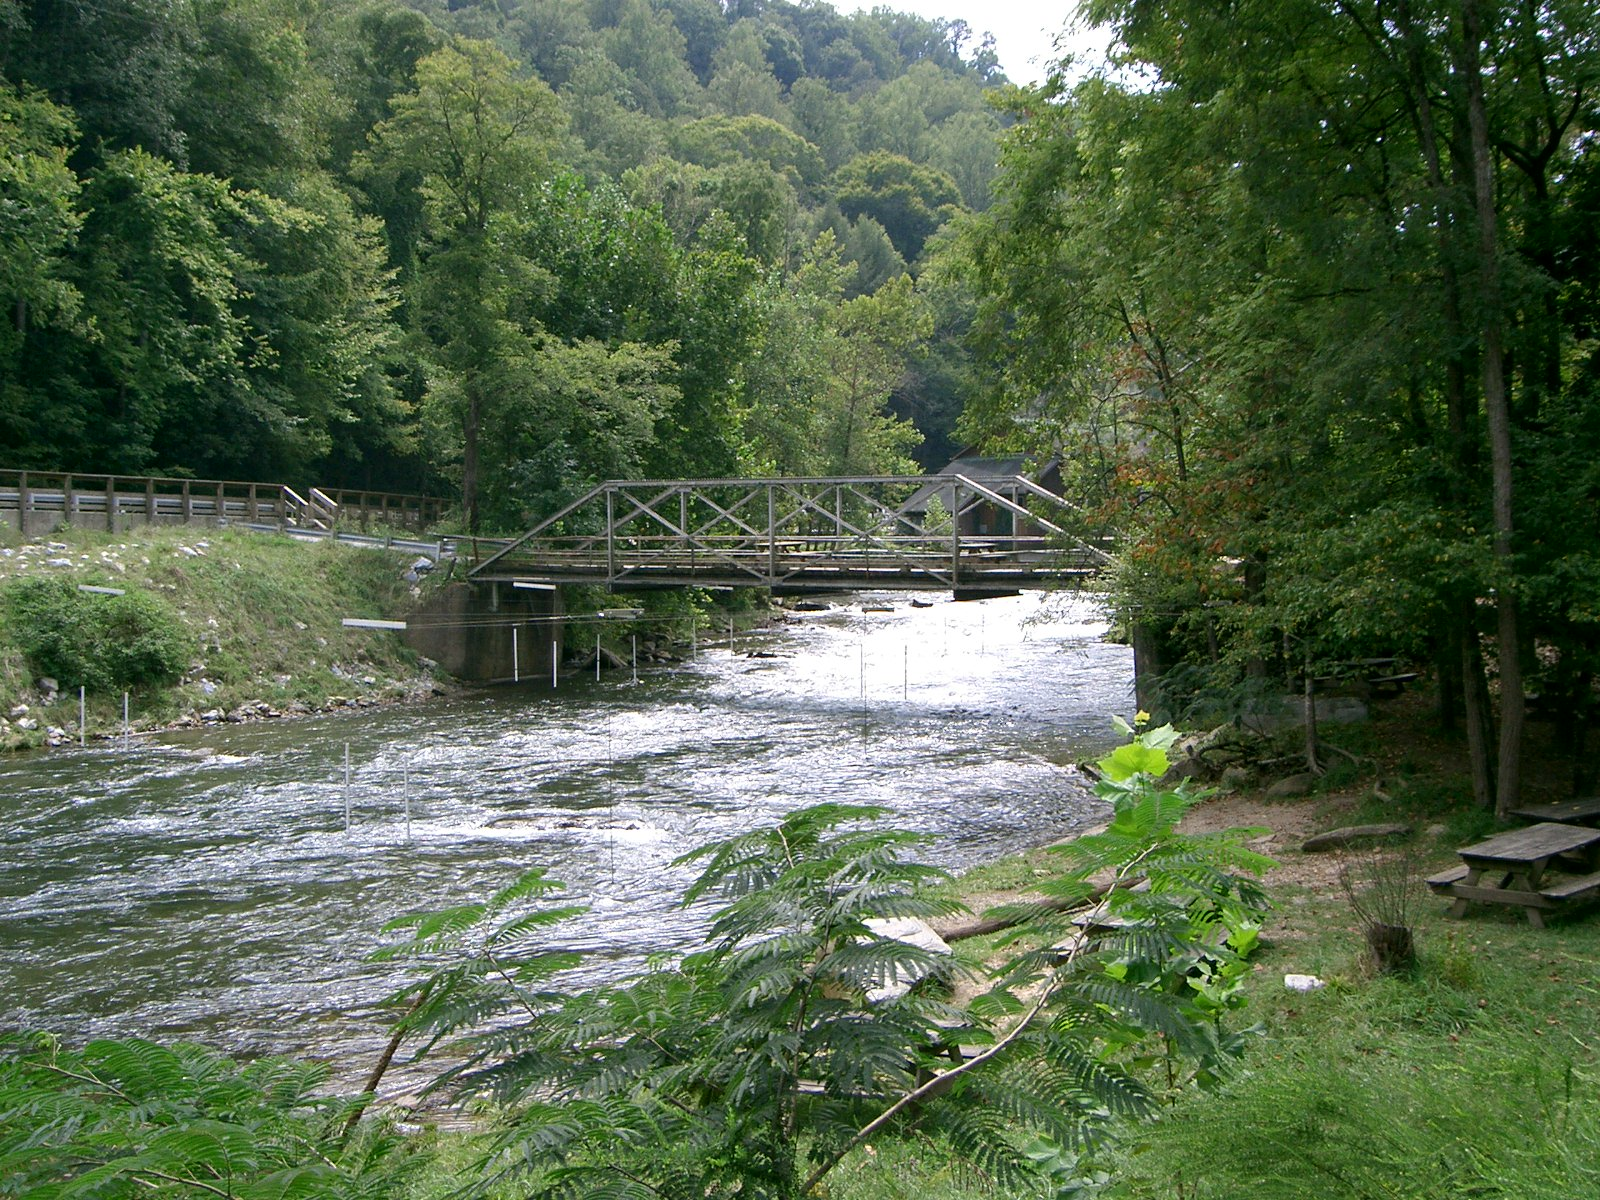 Nantahala River - Wikipedia